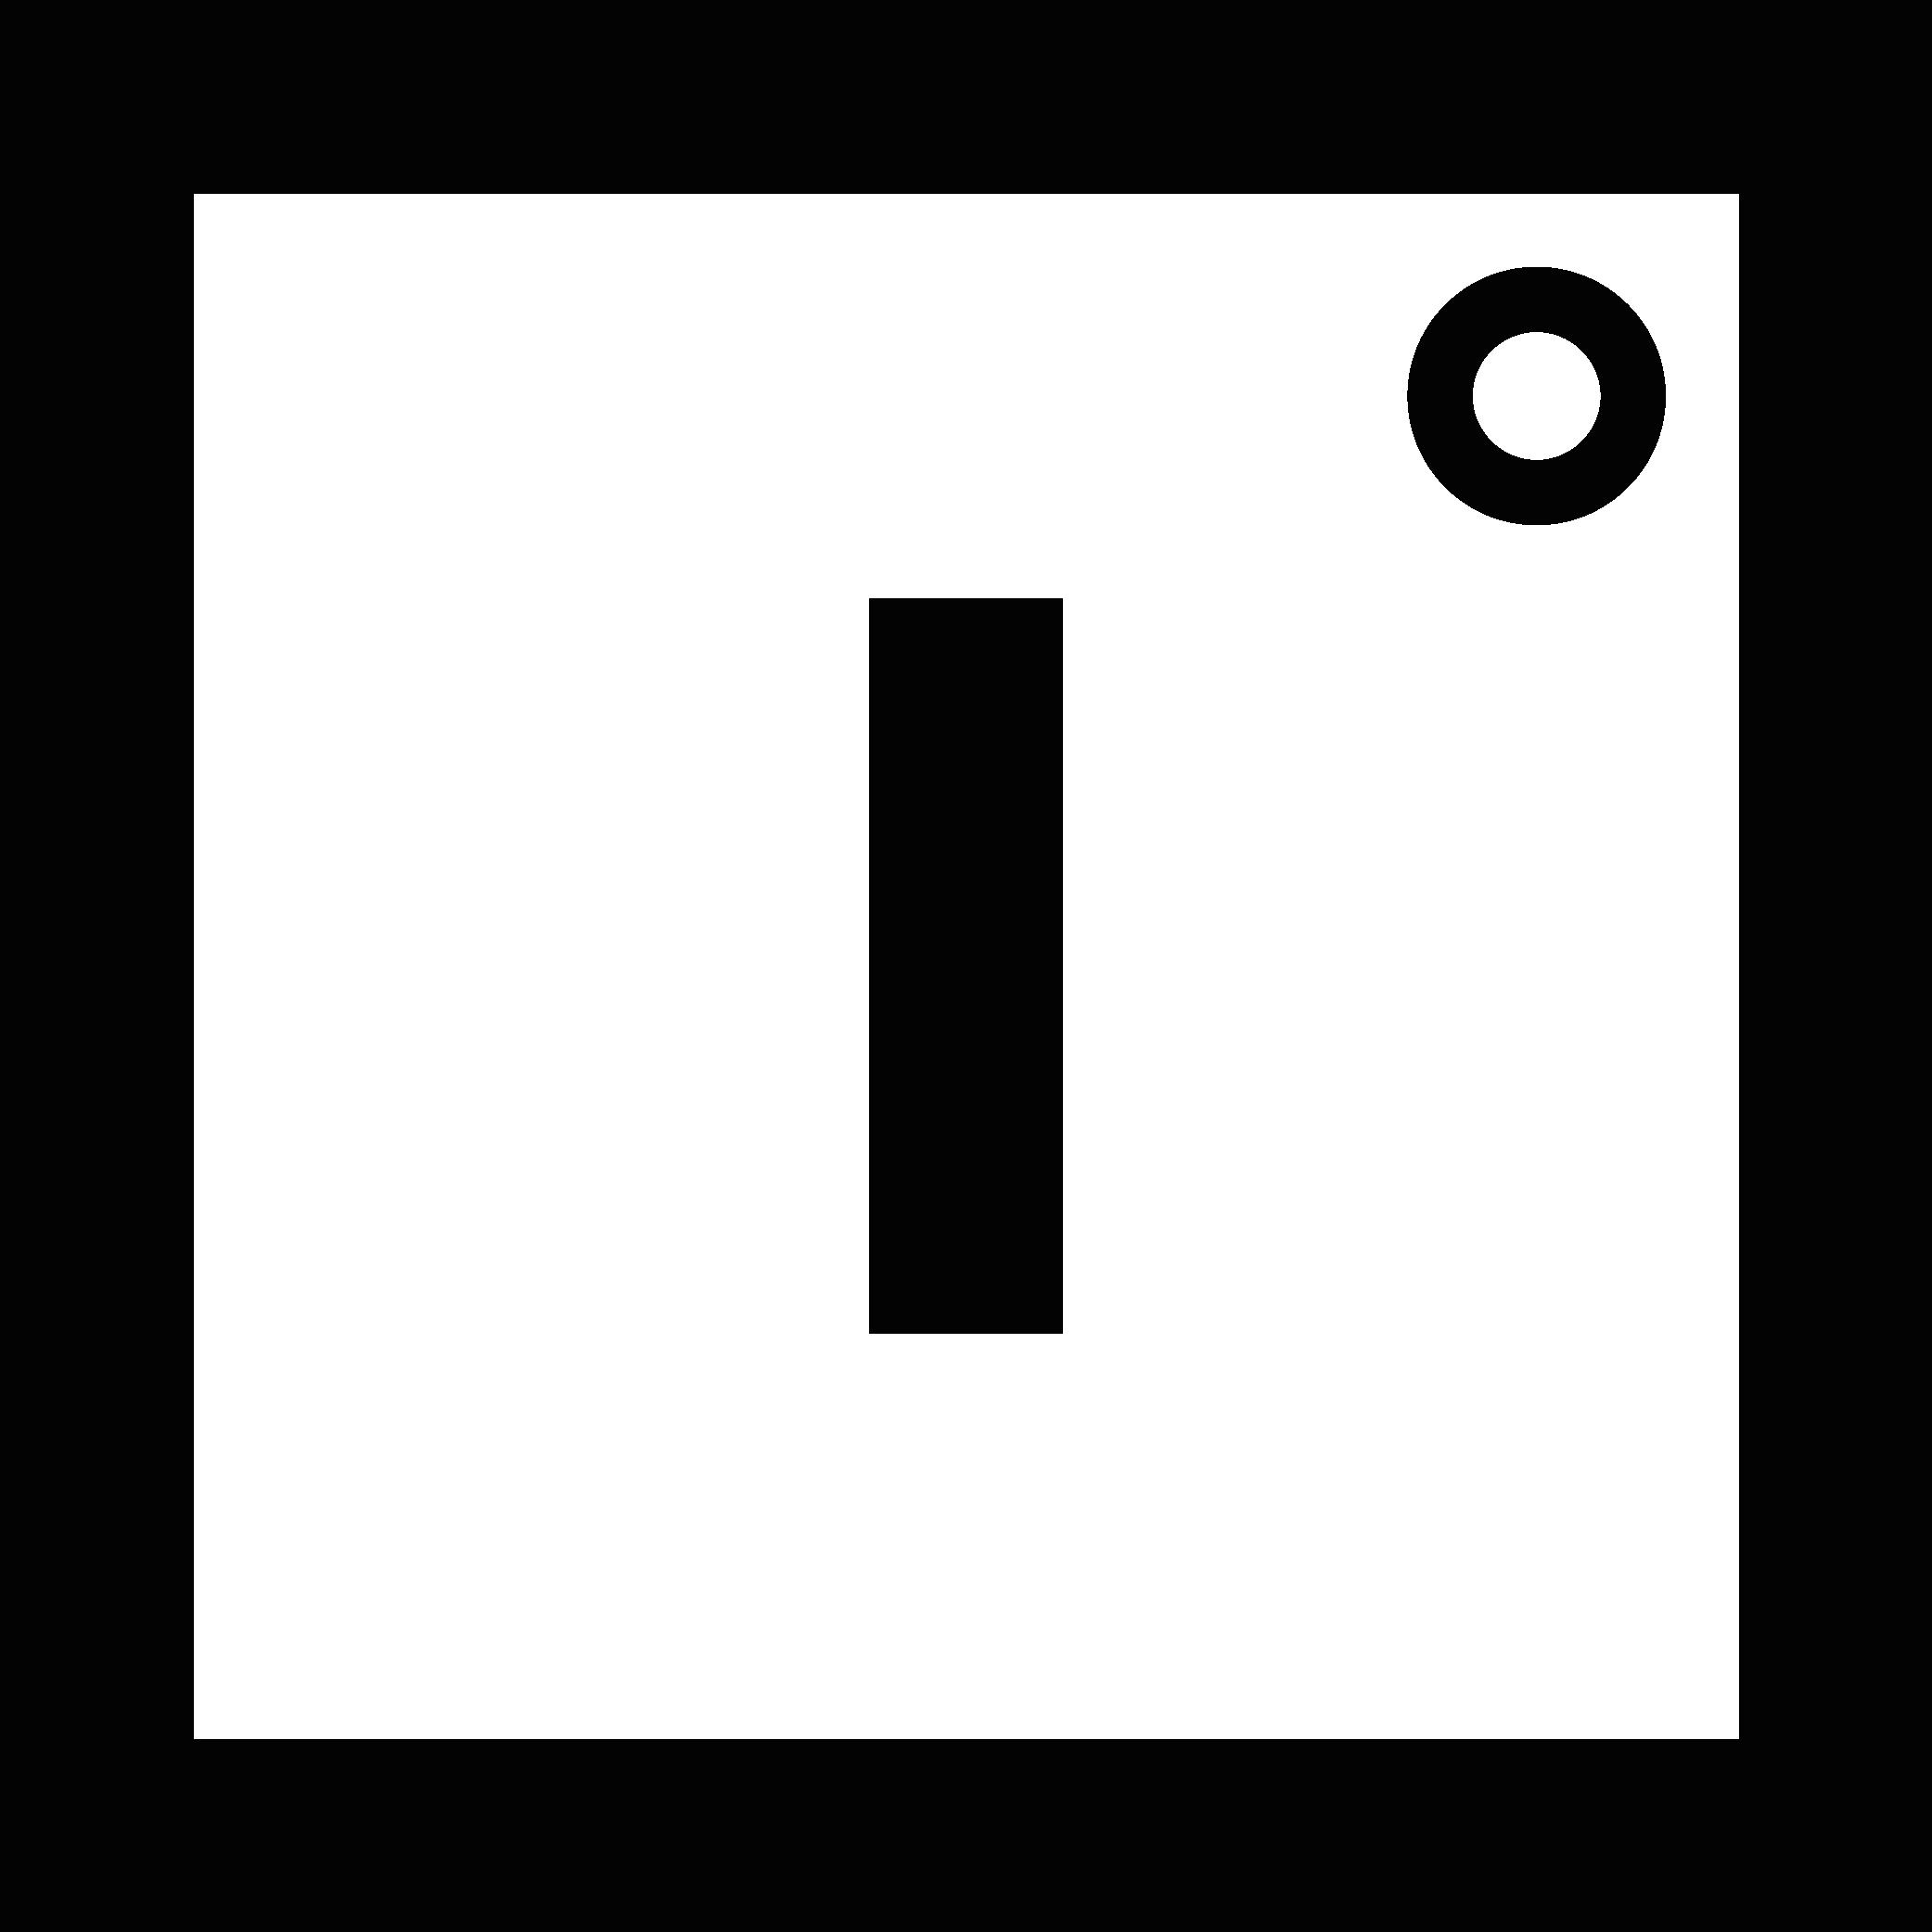 Improbable logo